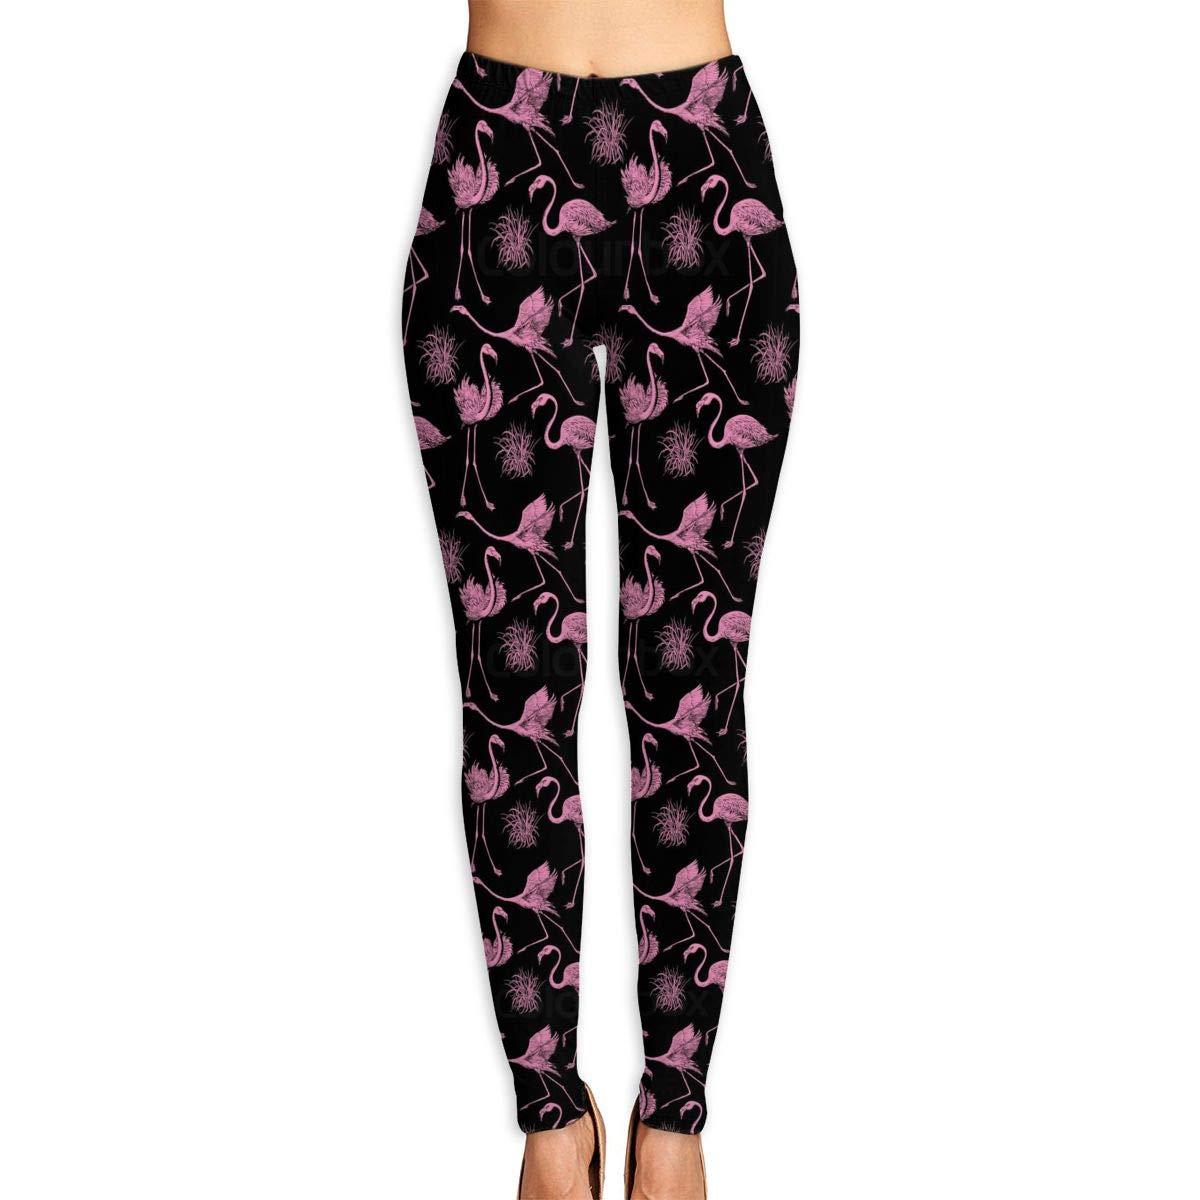 fda9c207b736a Amazon.com: Fly Flamingo Feather Women's Yoga Capri Pants Active Sport  Workout Running Leggings: Clothing